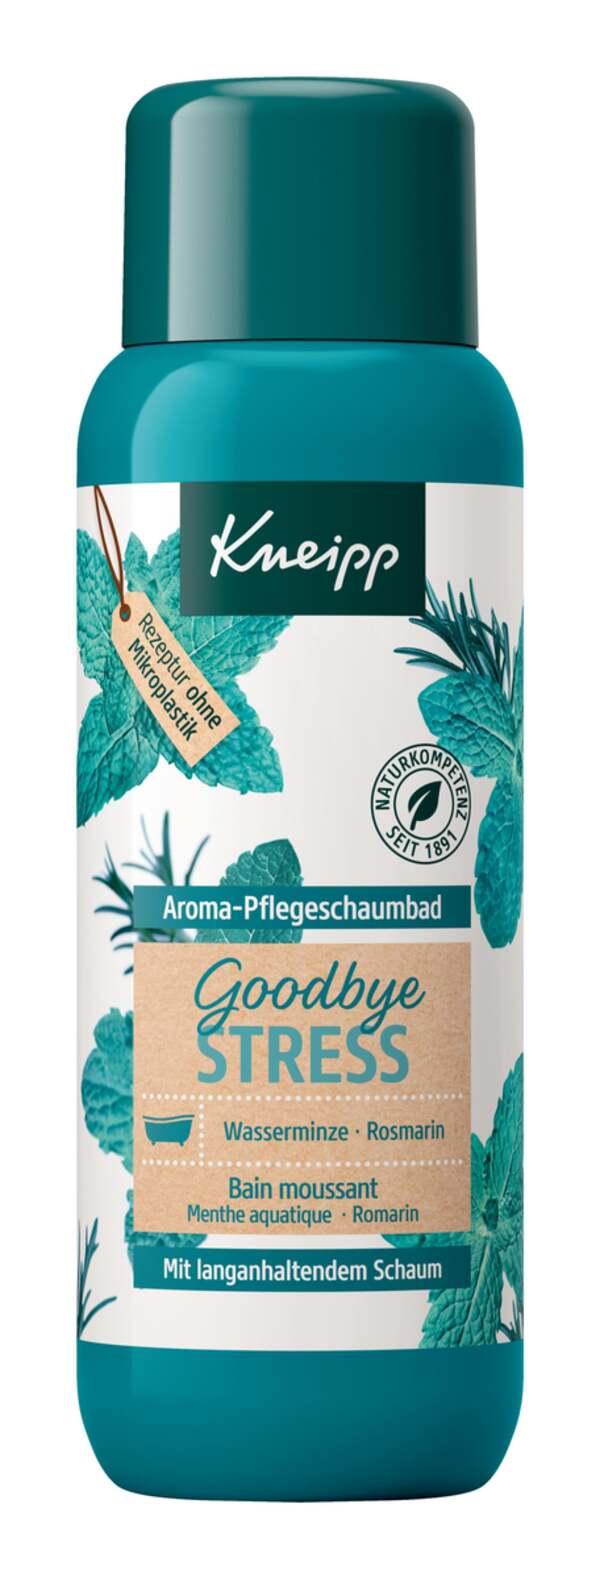 Kneipp Aroma-Pflegeschaumbad Goodbye Stress